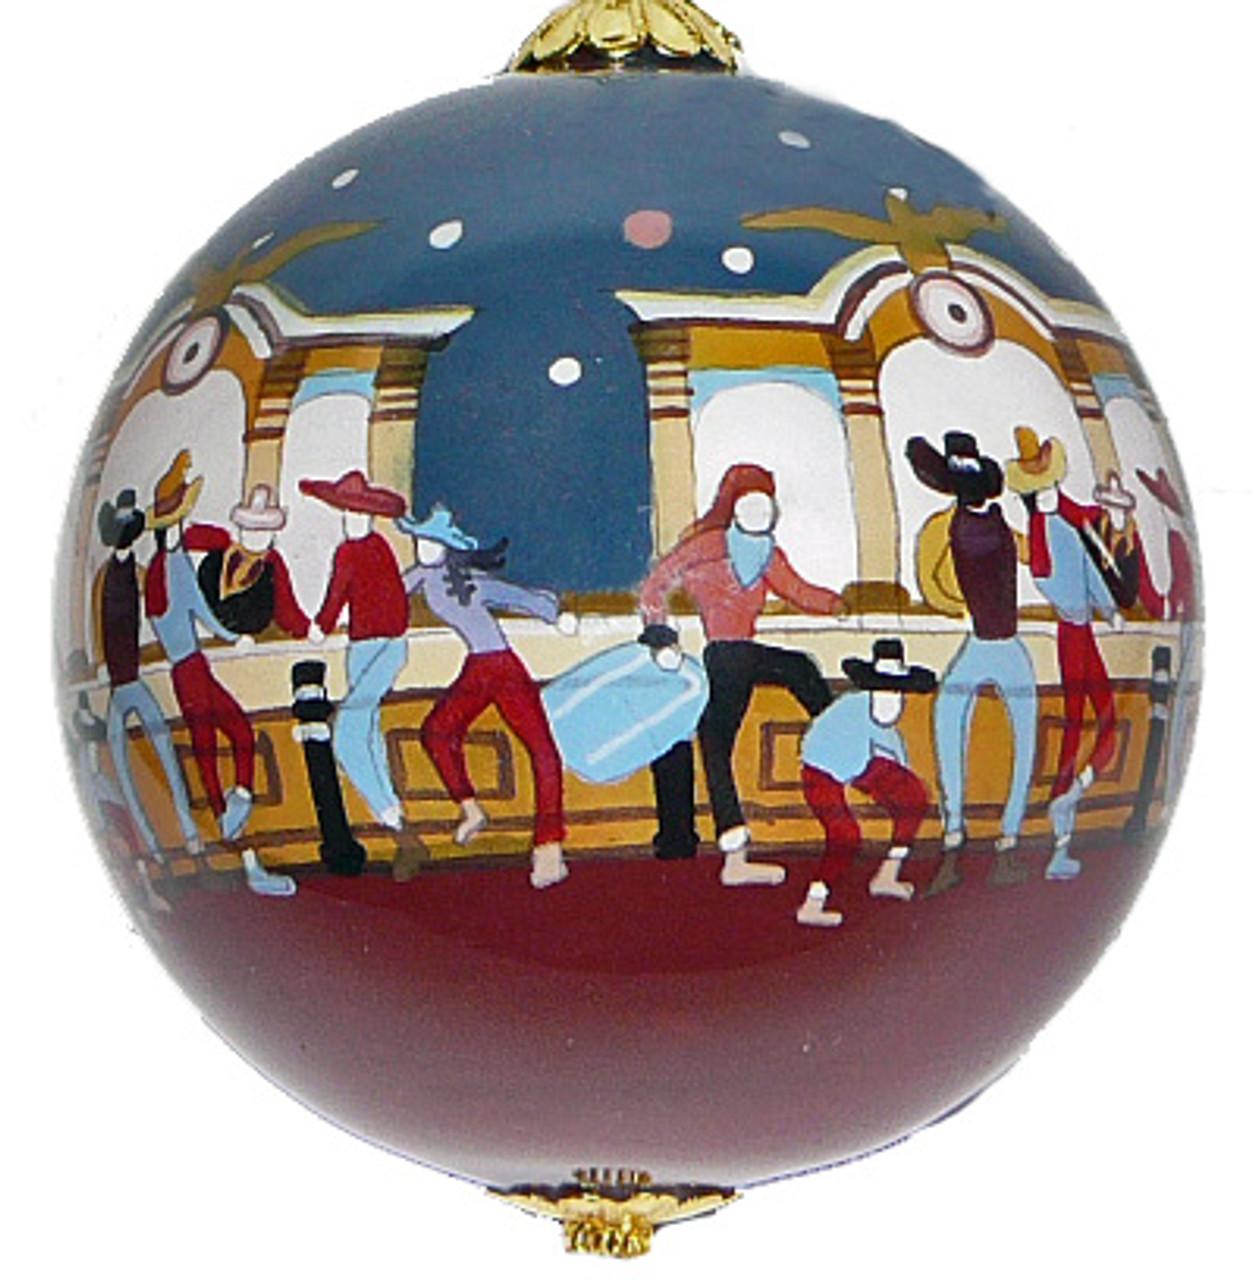 Saloon - Ornament Set of 2